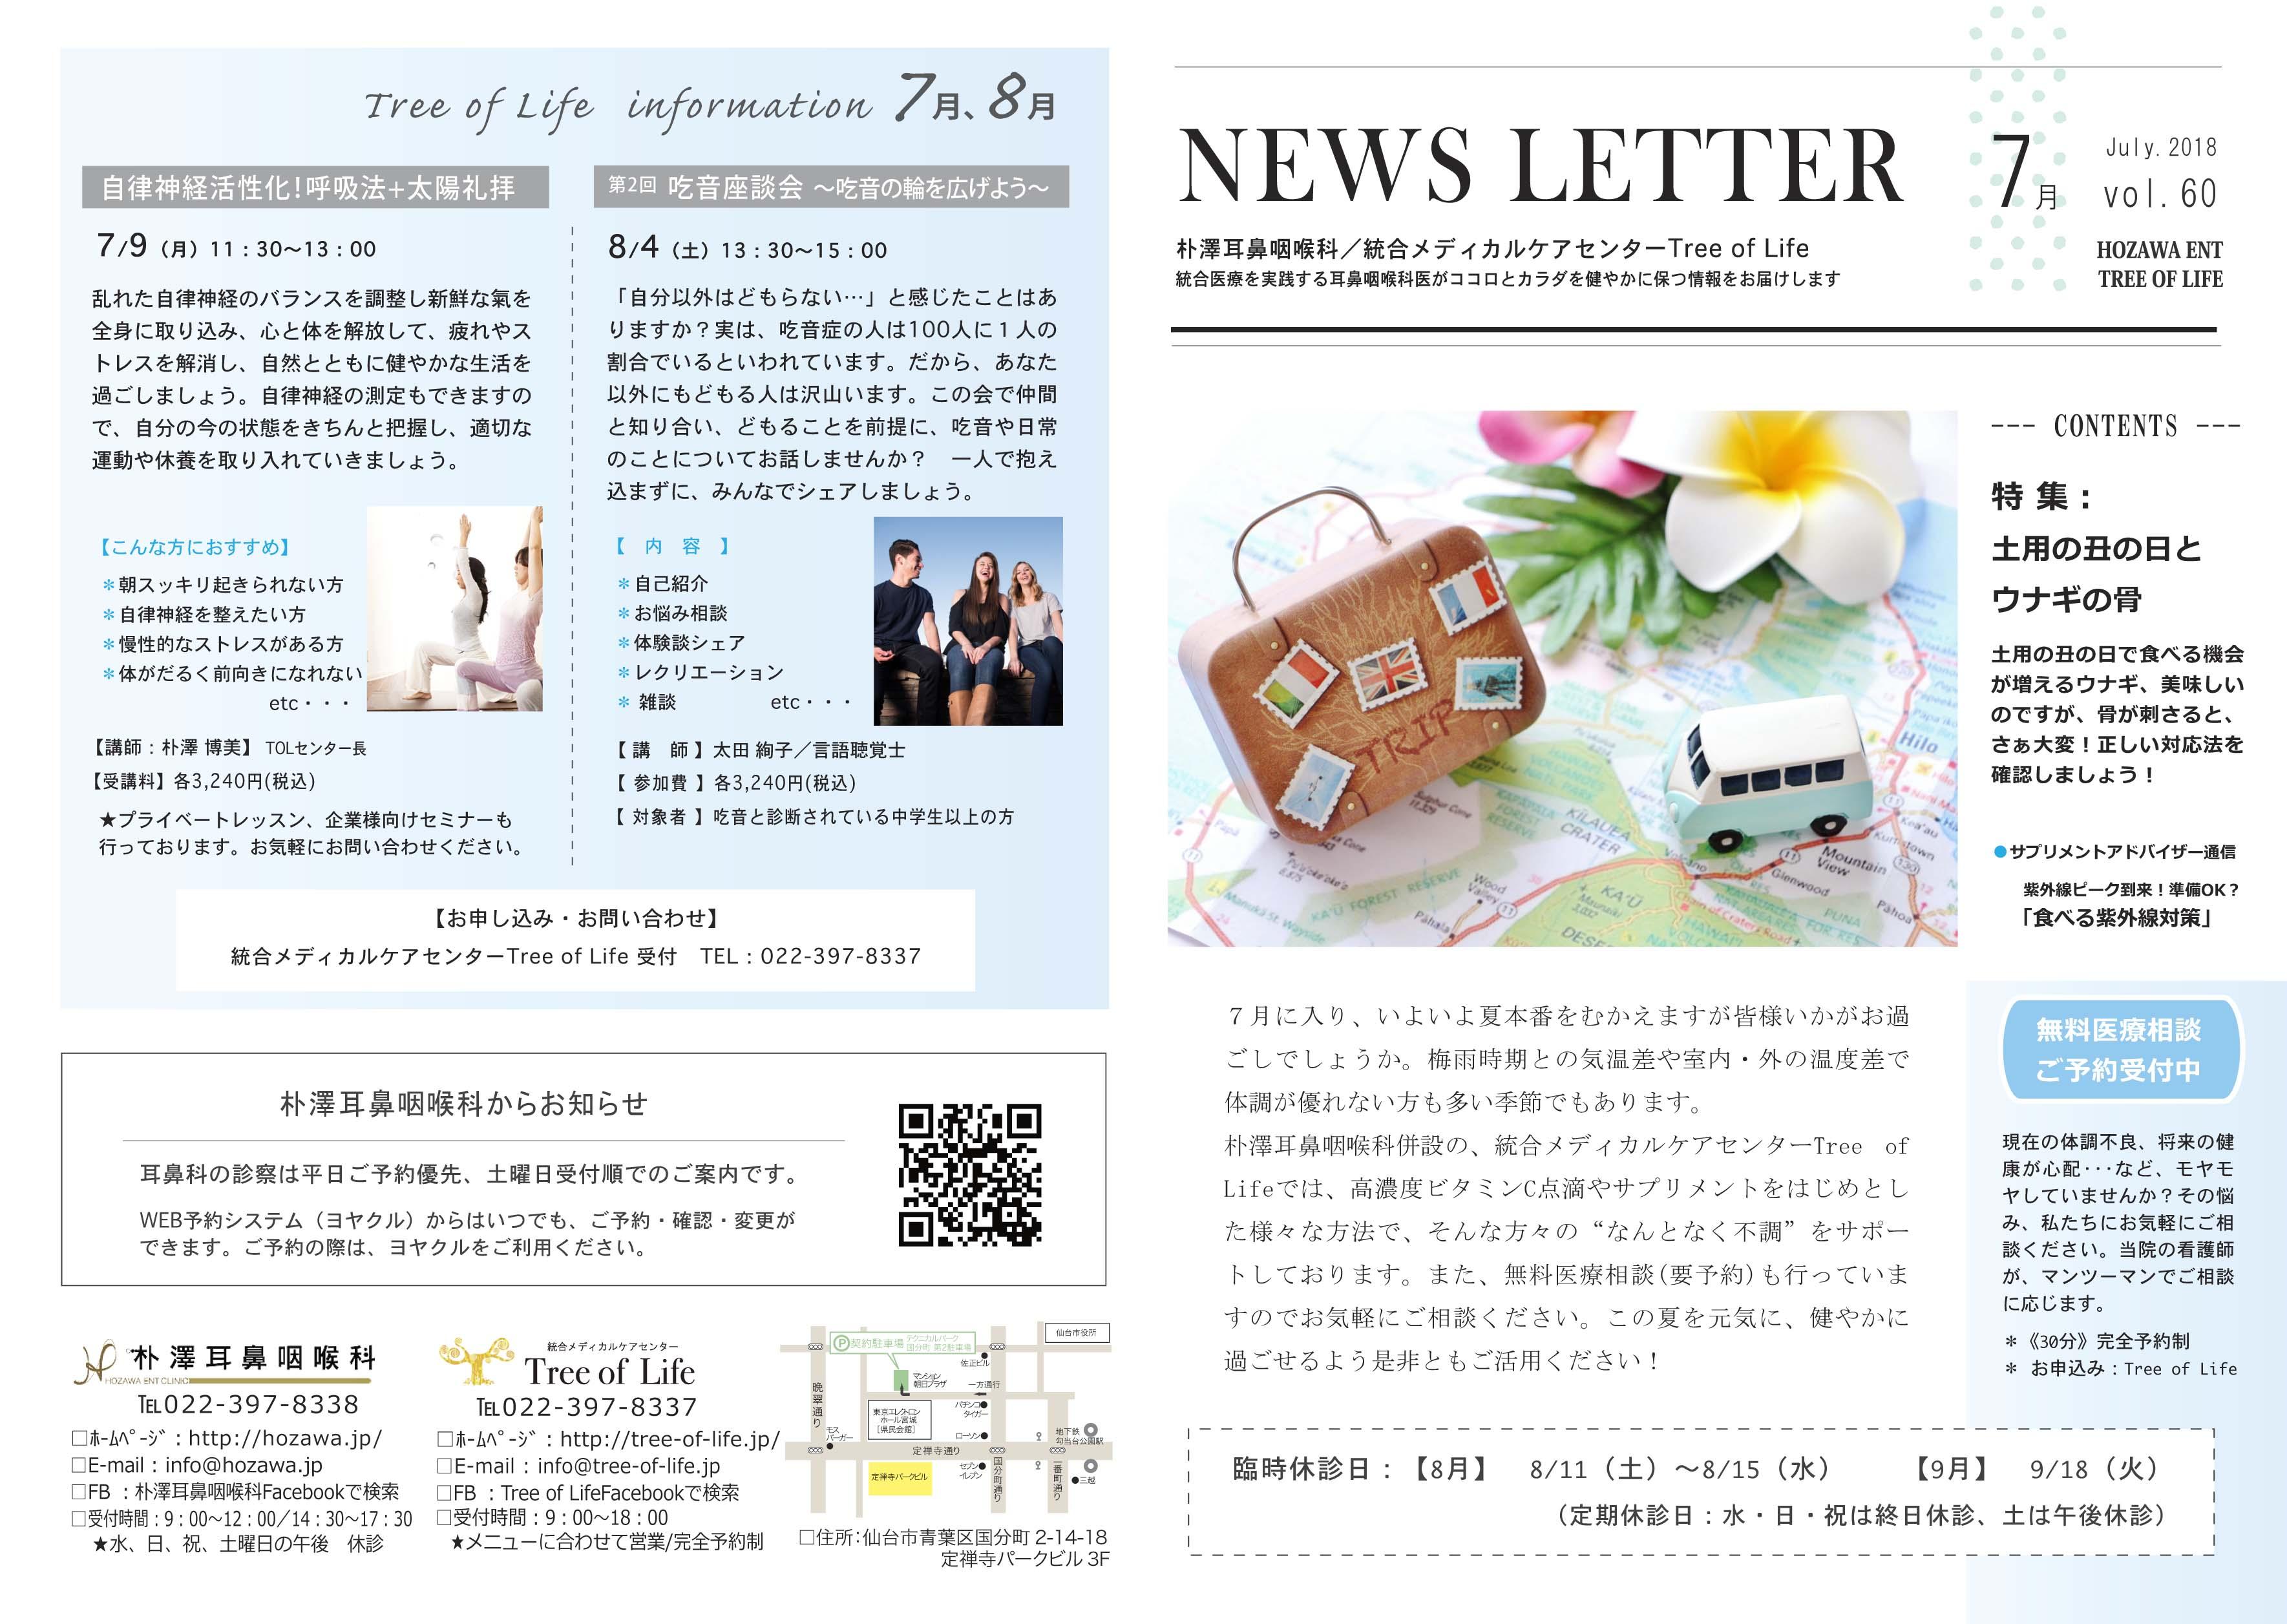 http://hozawa.jp/news/news_img/newsletter_omote7.jpg